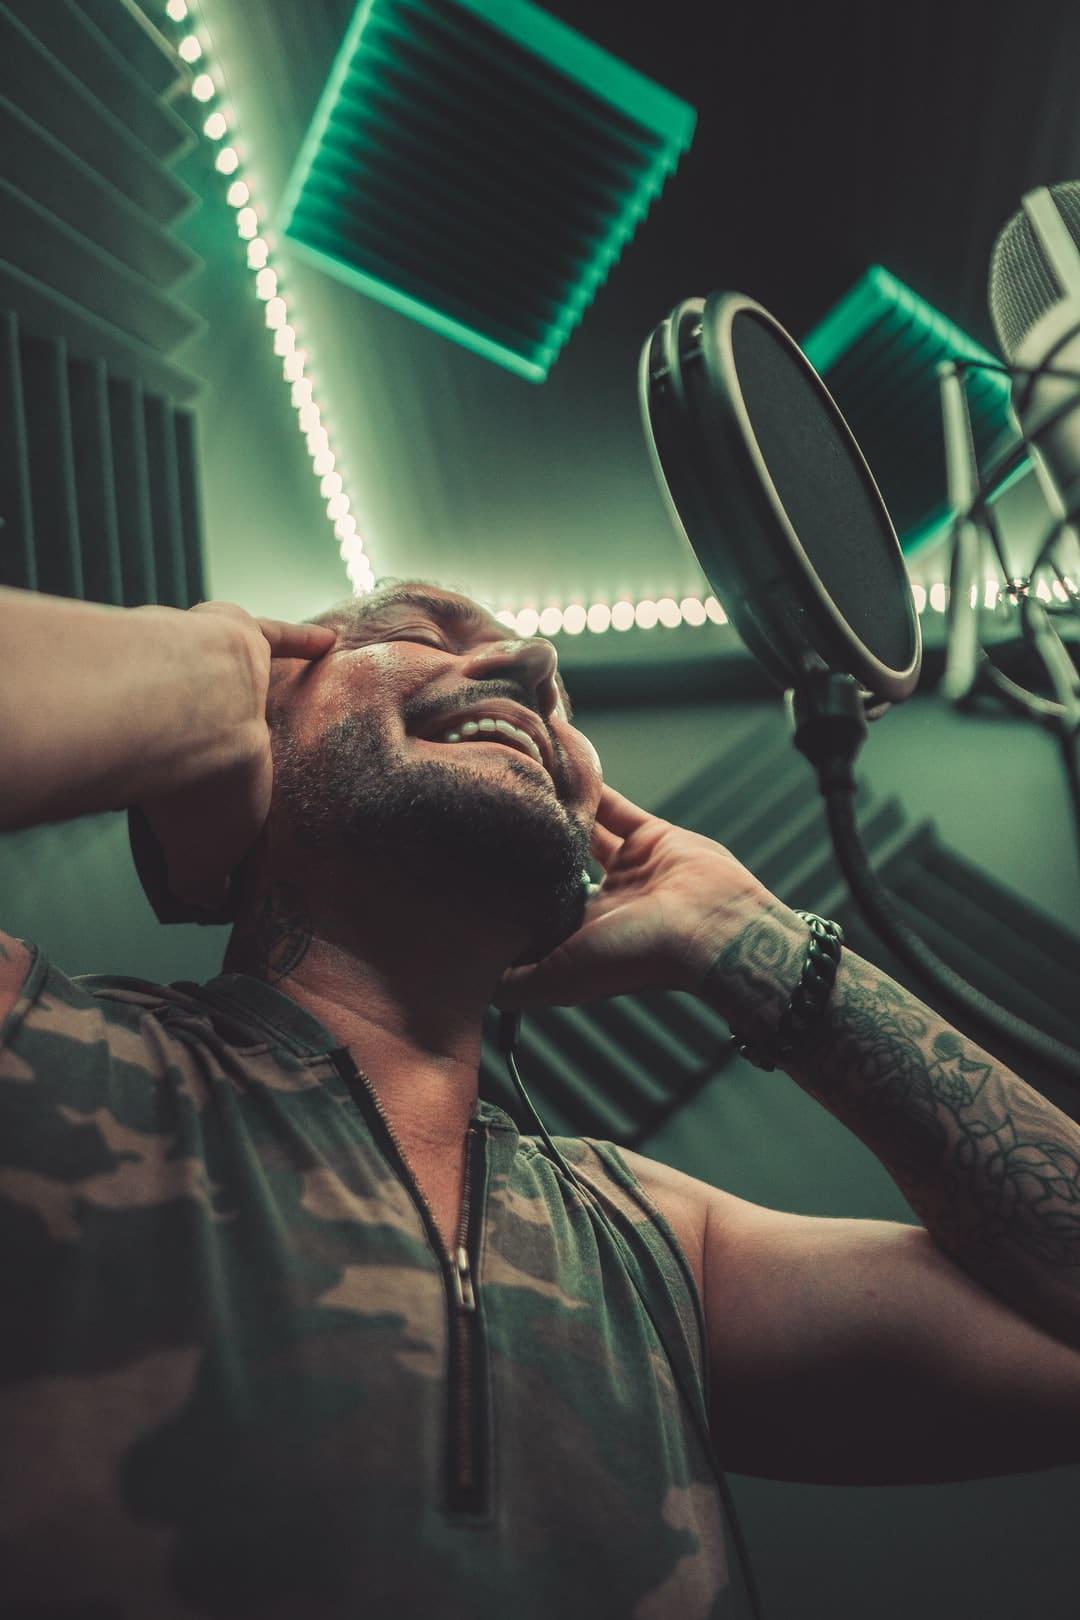 diy soundproof music room